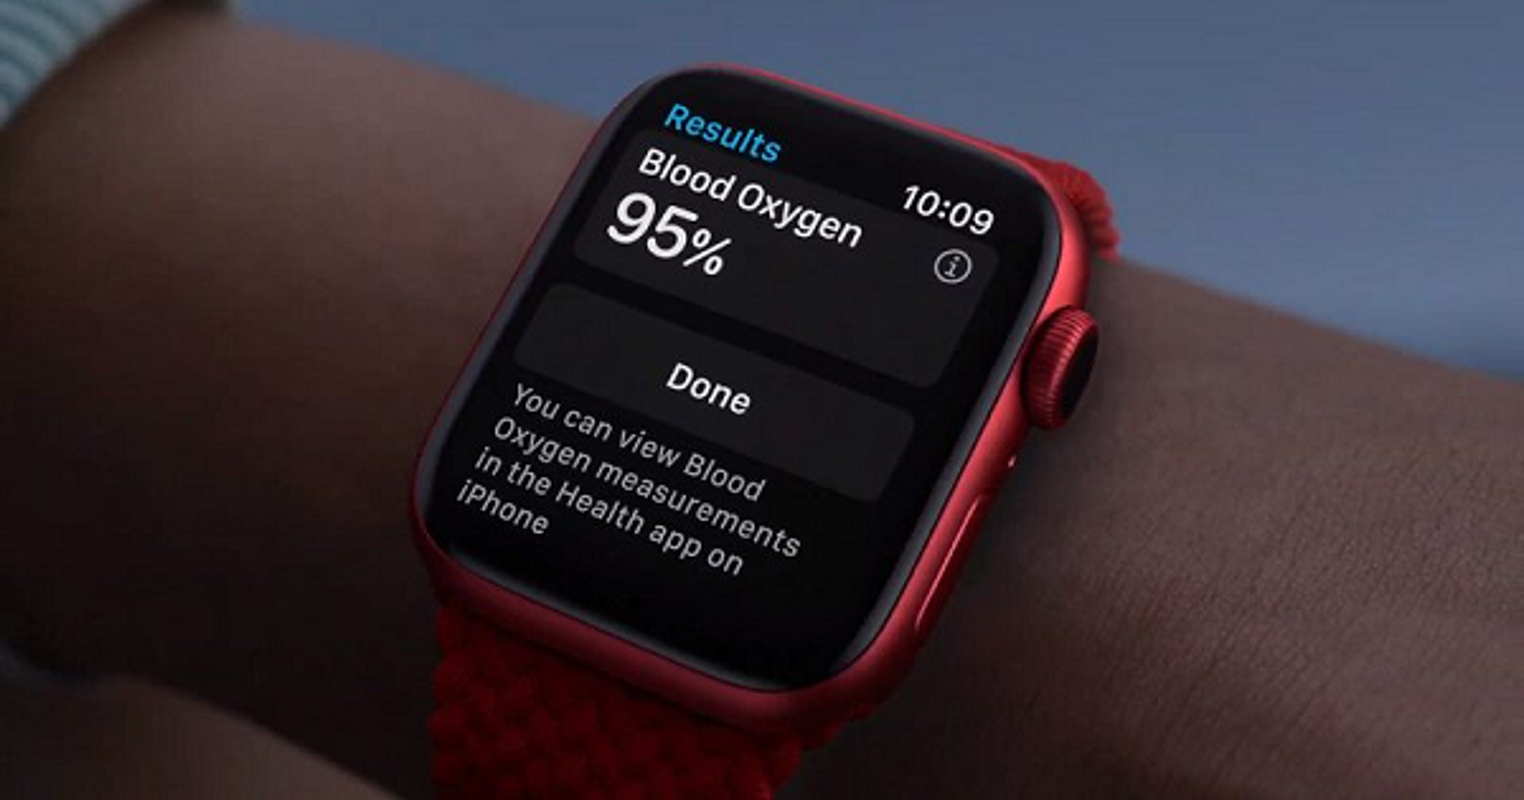 Apple Watch do duoc nong do con va duong huyet trong tuong lai?-Hinh-12